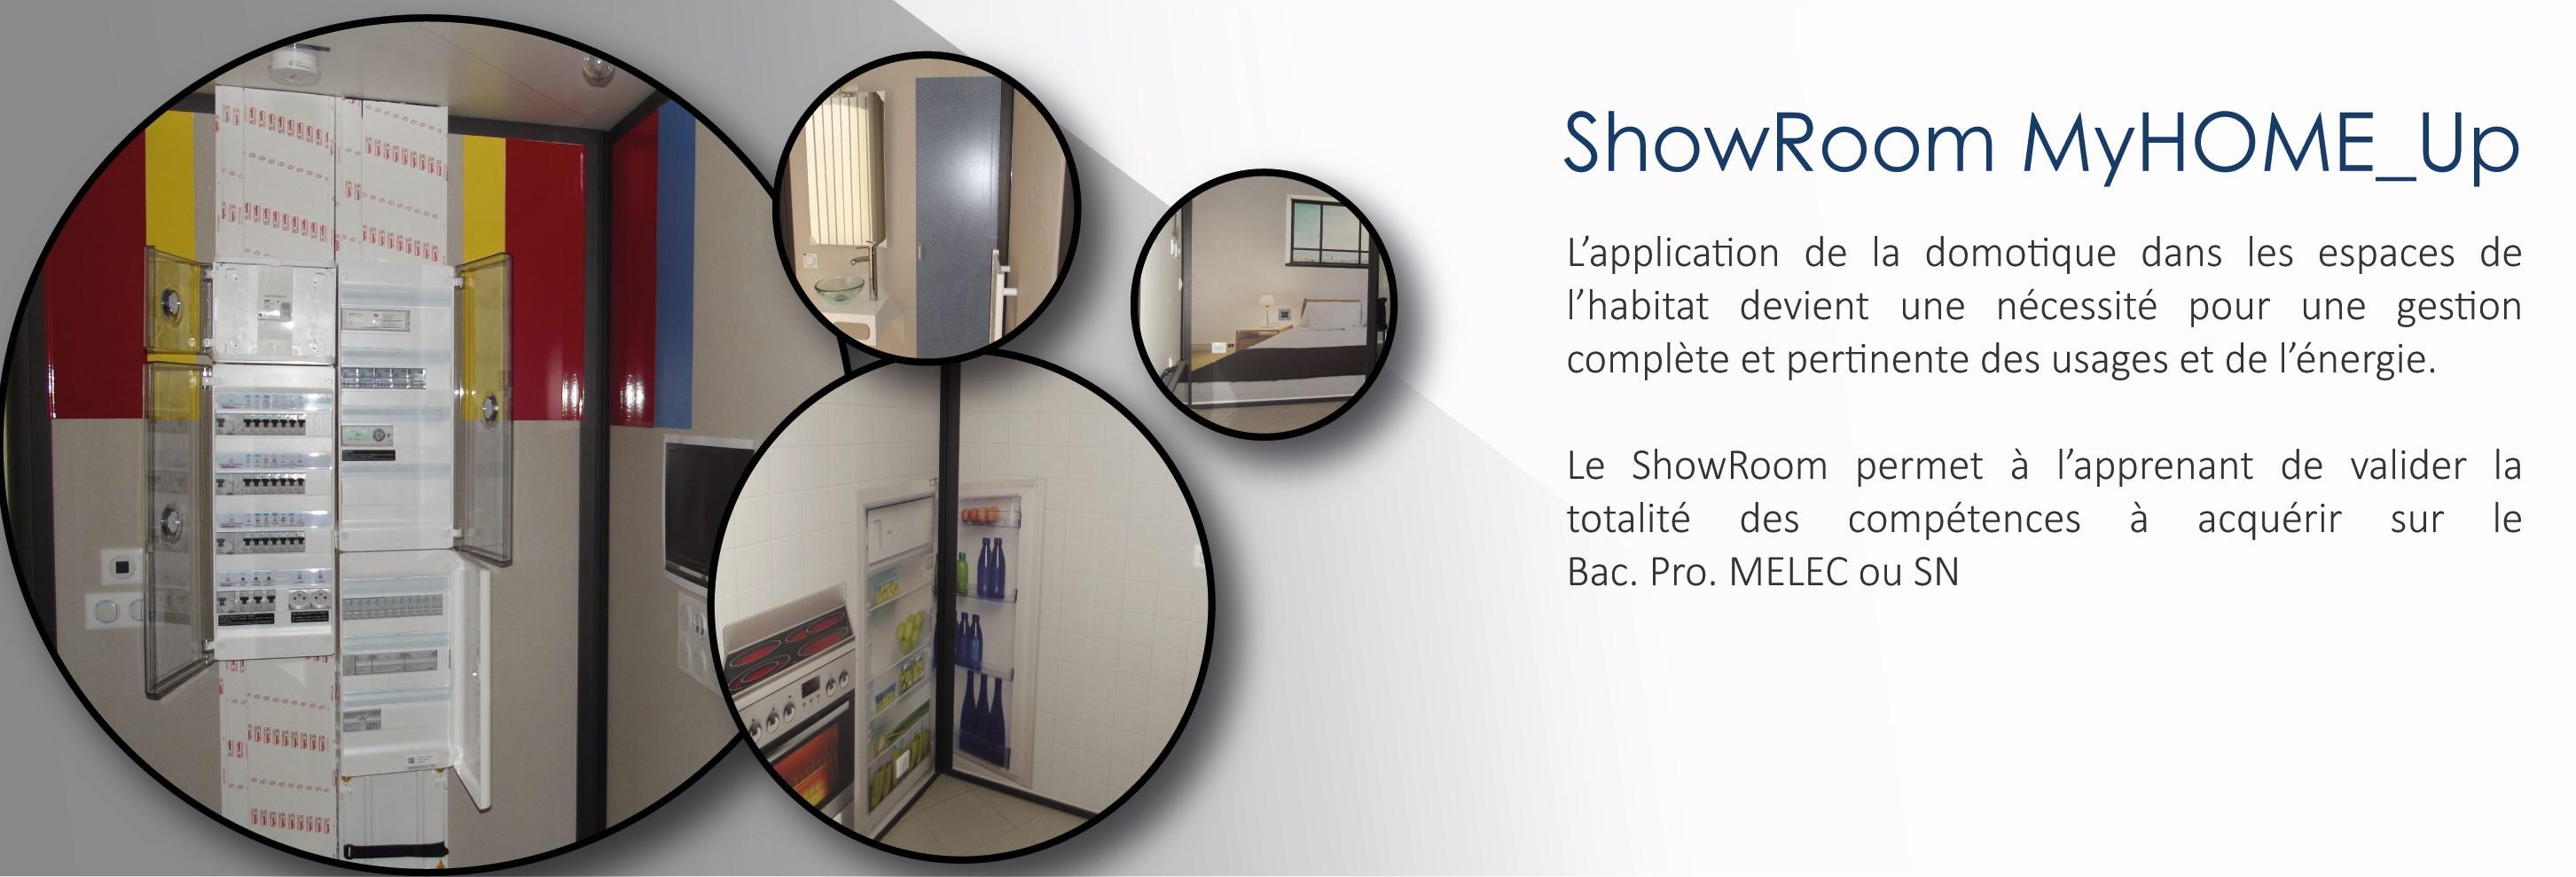 Showroom MyHome_Up